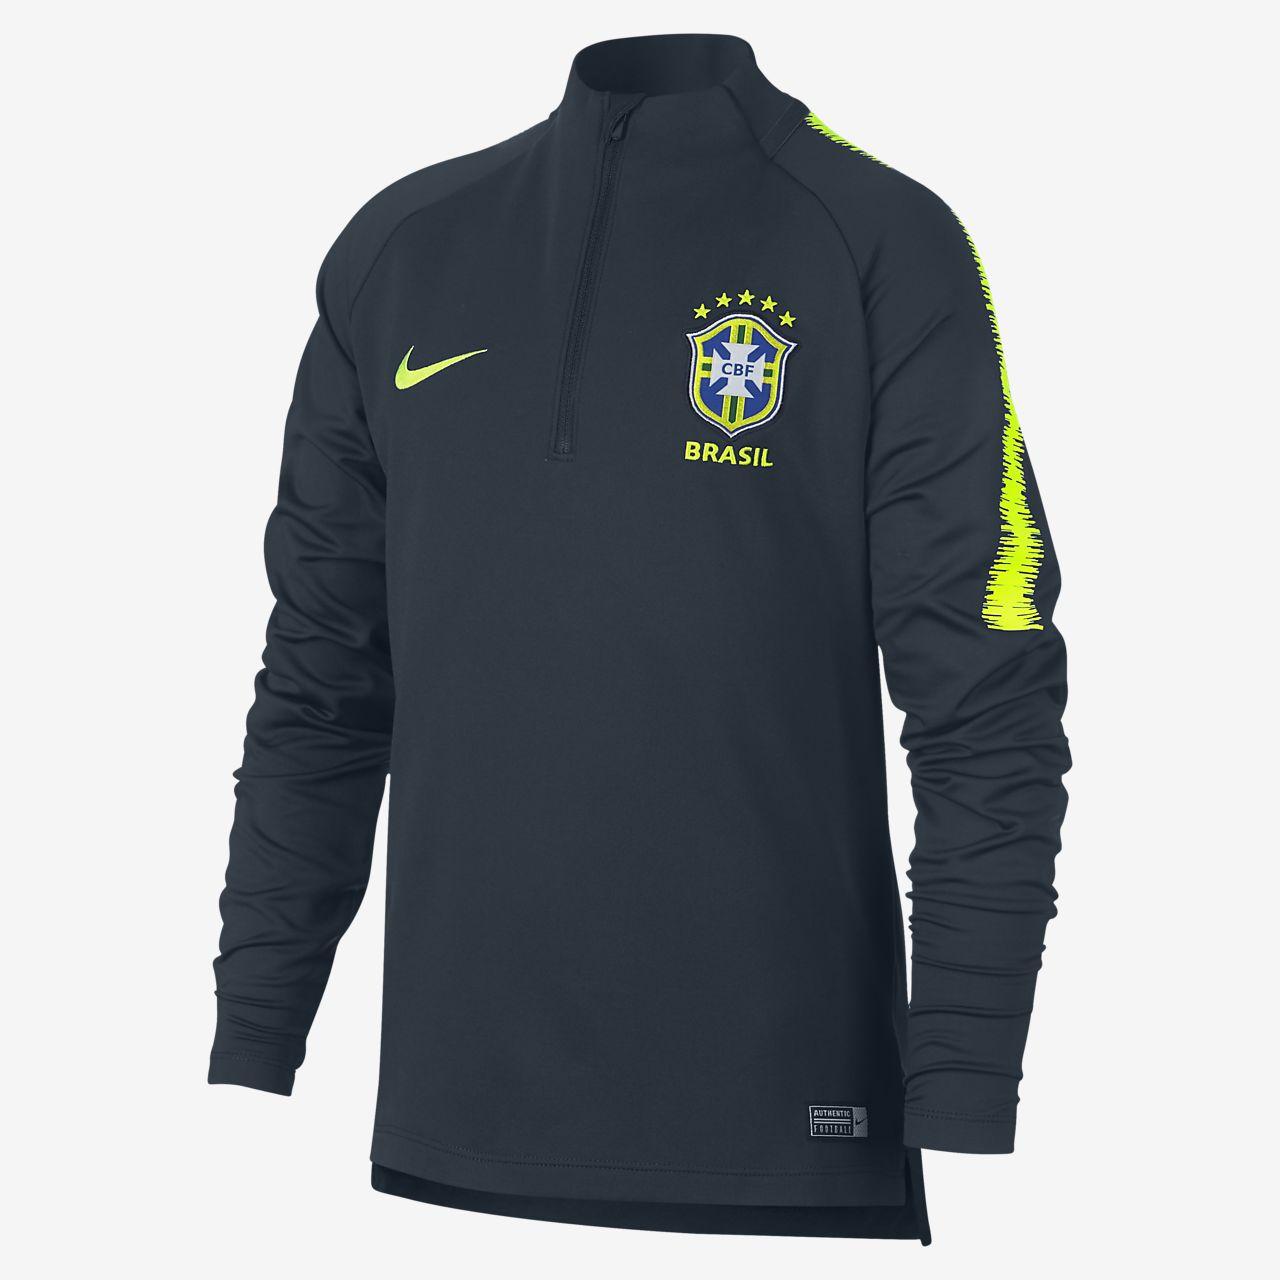 5621cc1323 ... Top de fútbol de manga larga para niños talla grande Brasil CBF Dri-FIT  Squad